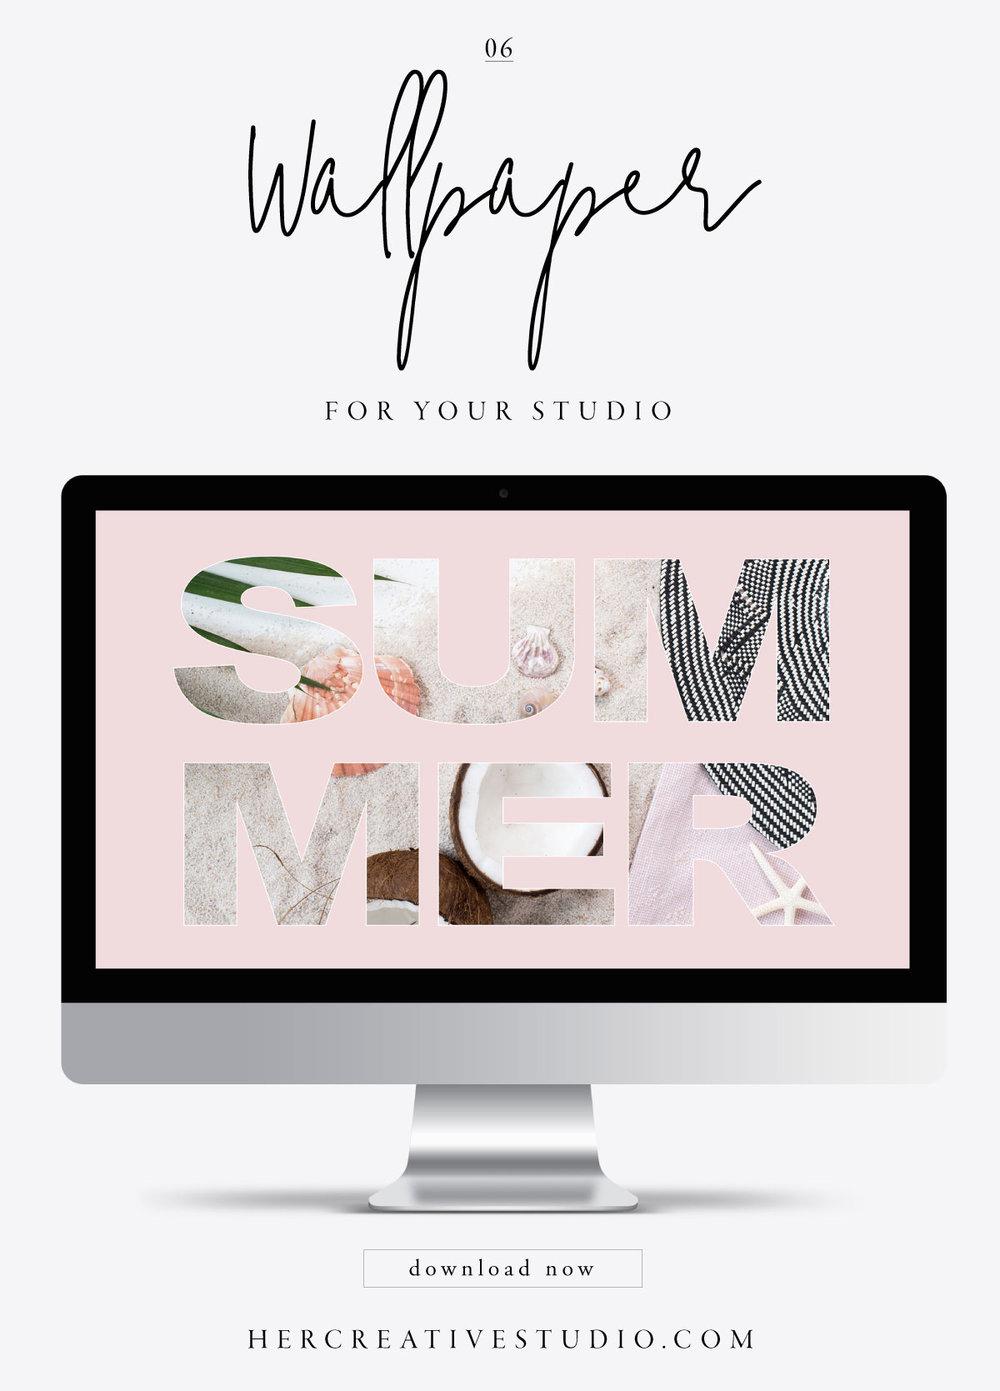 FREE Wallpaper download from her Creative Studio